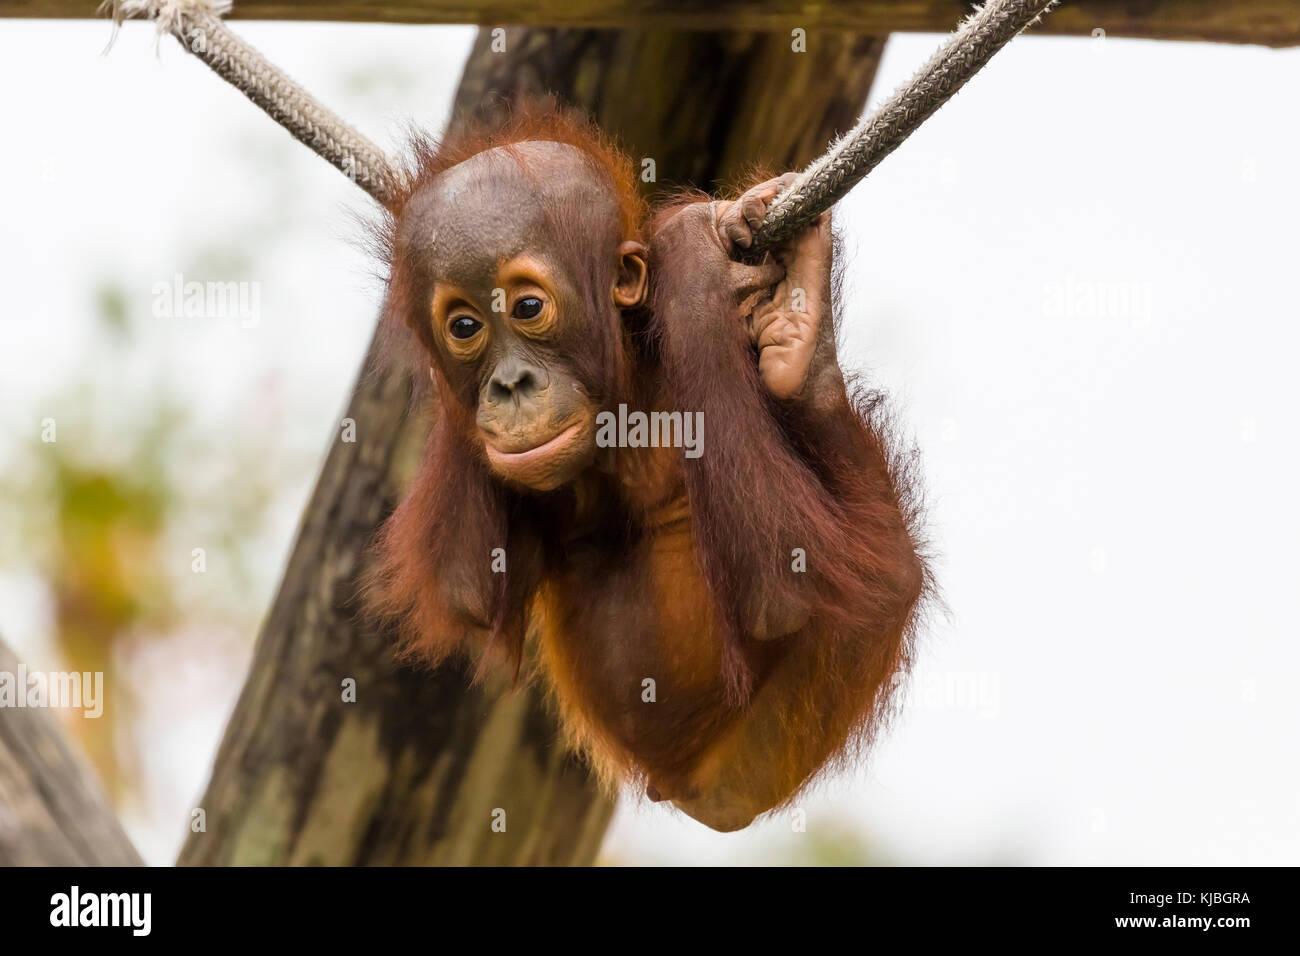 Bornean orango baby at the Lowry Park Zoo in Tampa Florida USA / Stati Uniti Immagini Stock